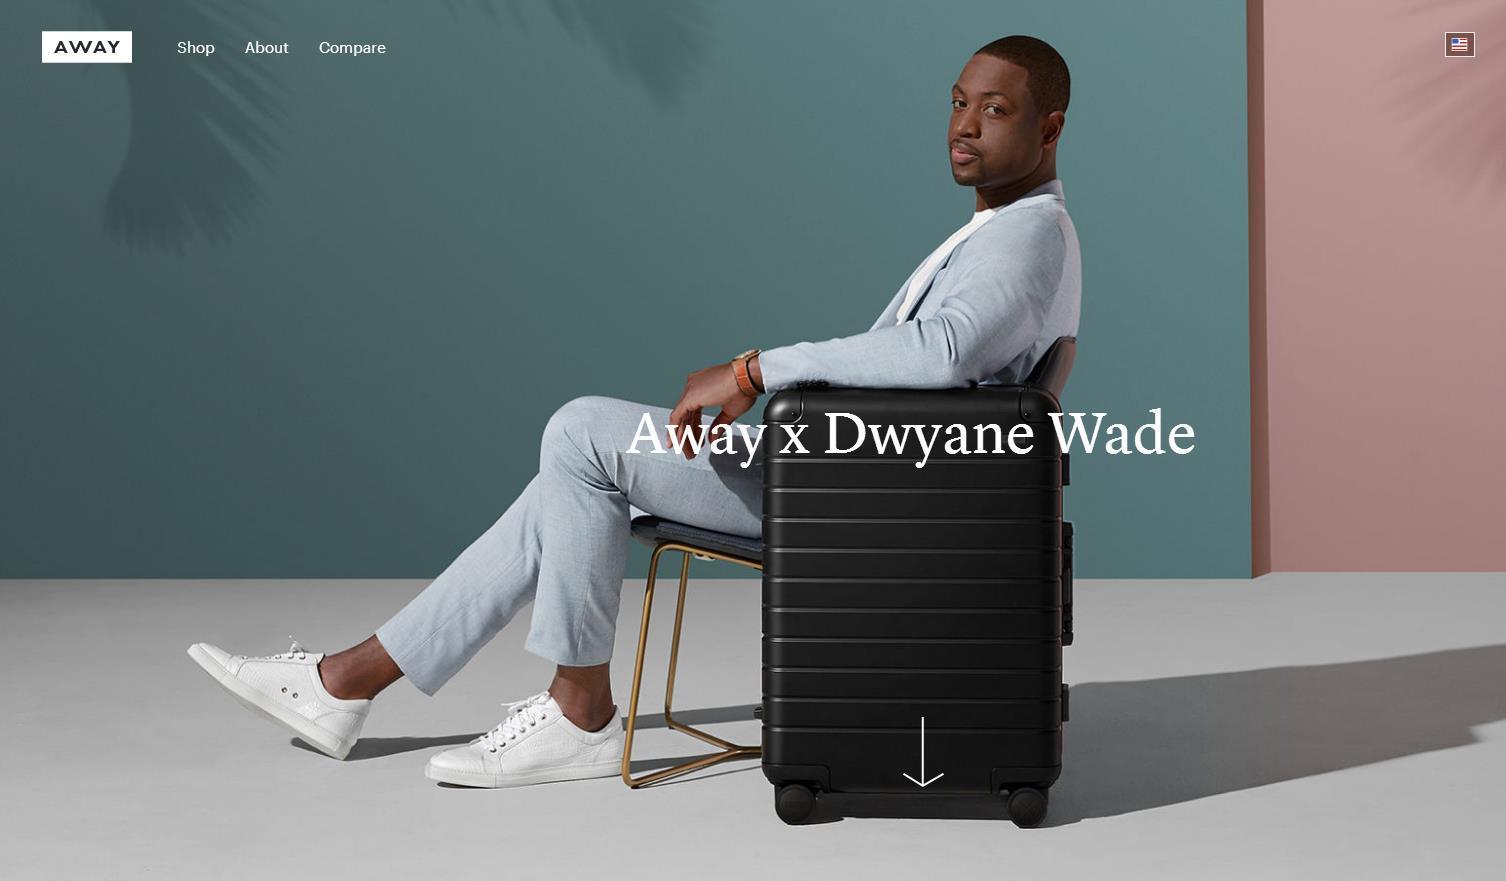 Away:互联网行李箱品牌C轮融资5000万美元